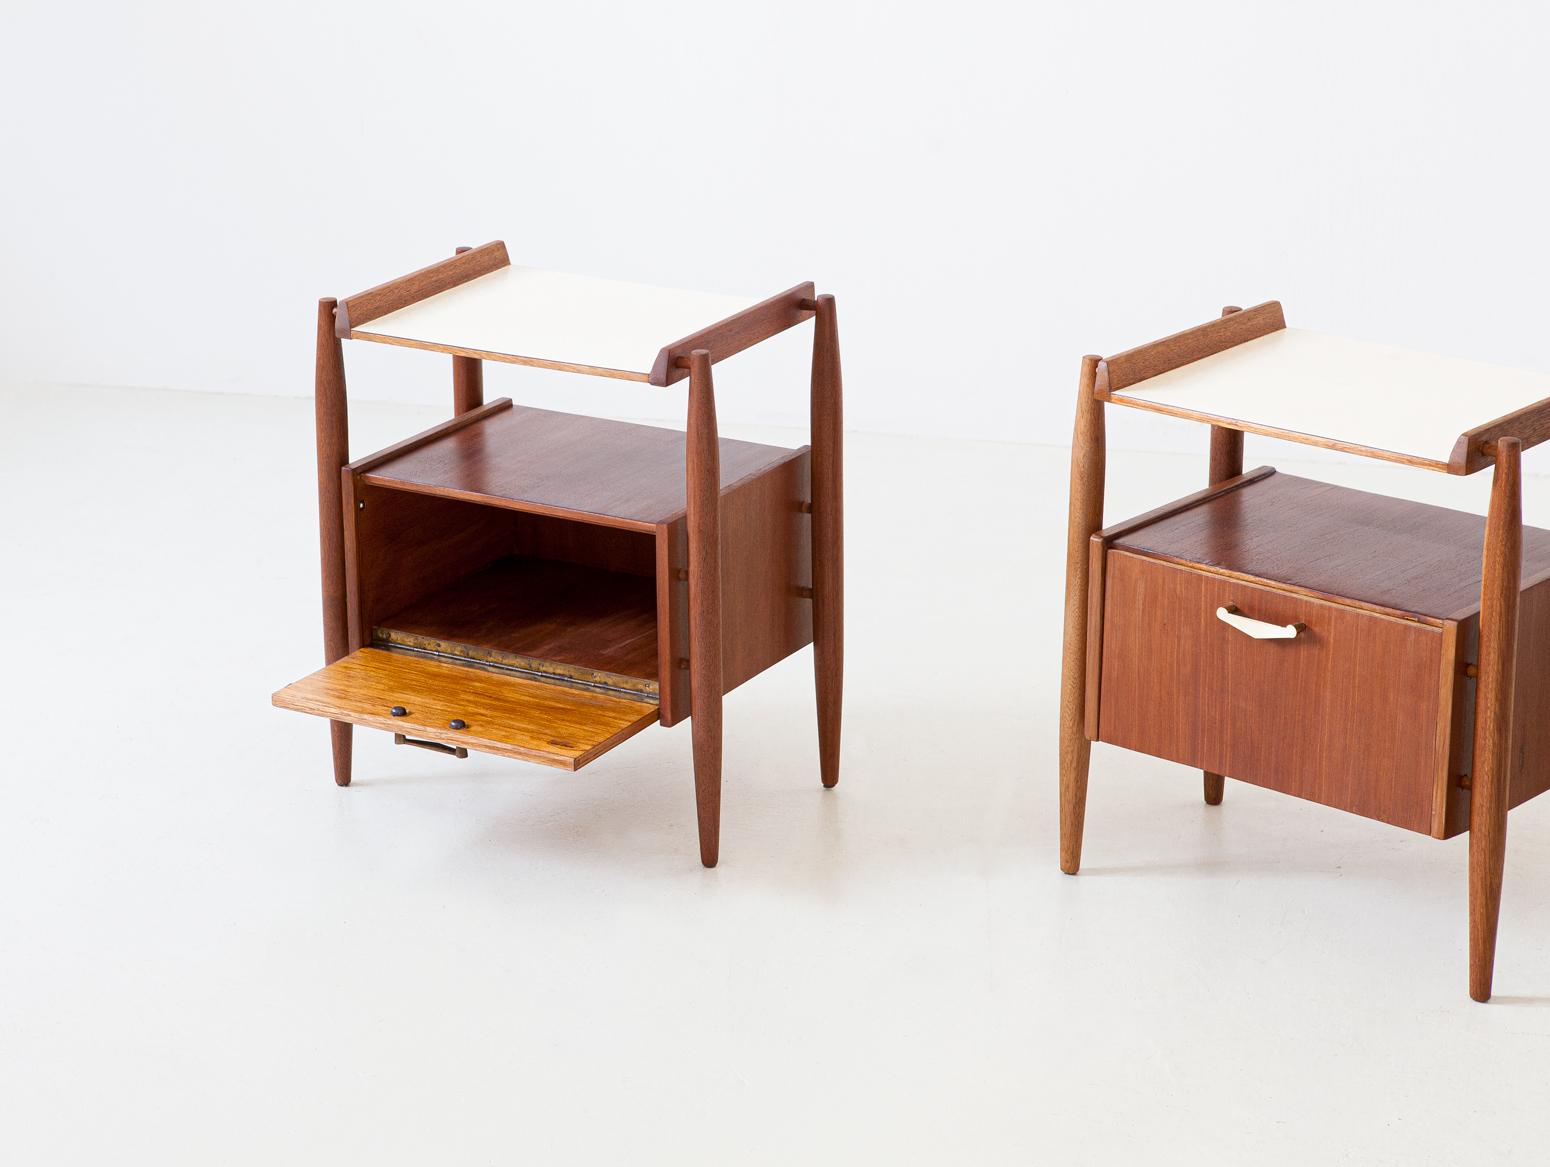 1950s-italian-bedside-tables-7-bt82